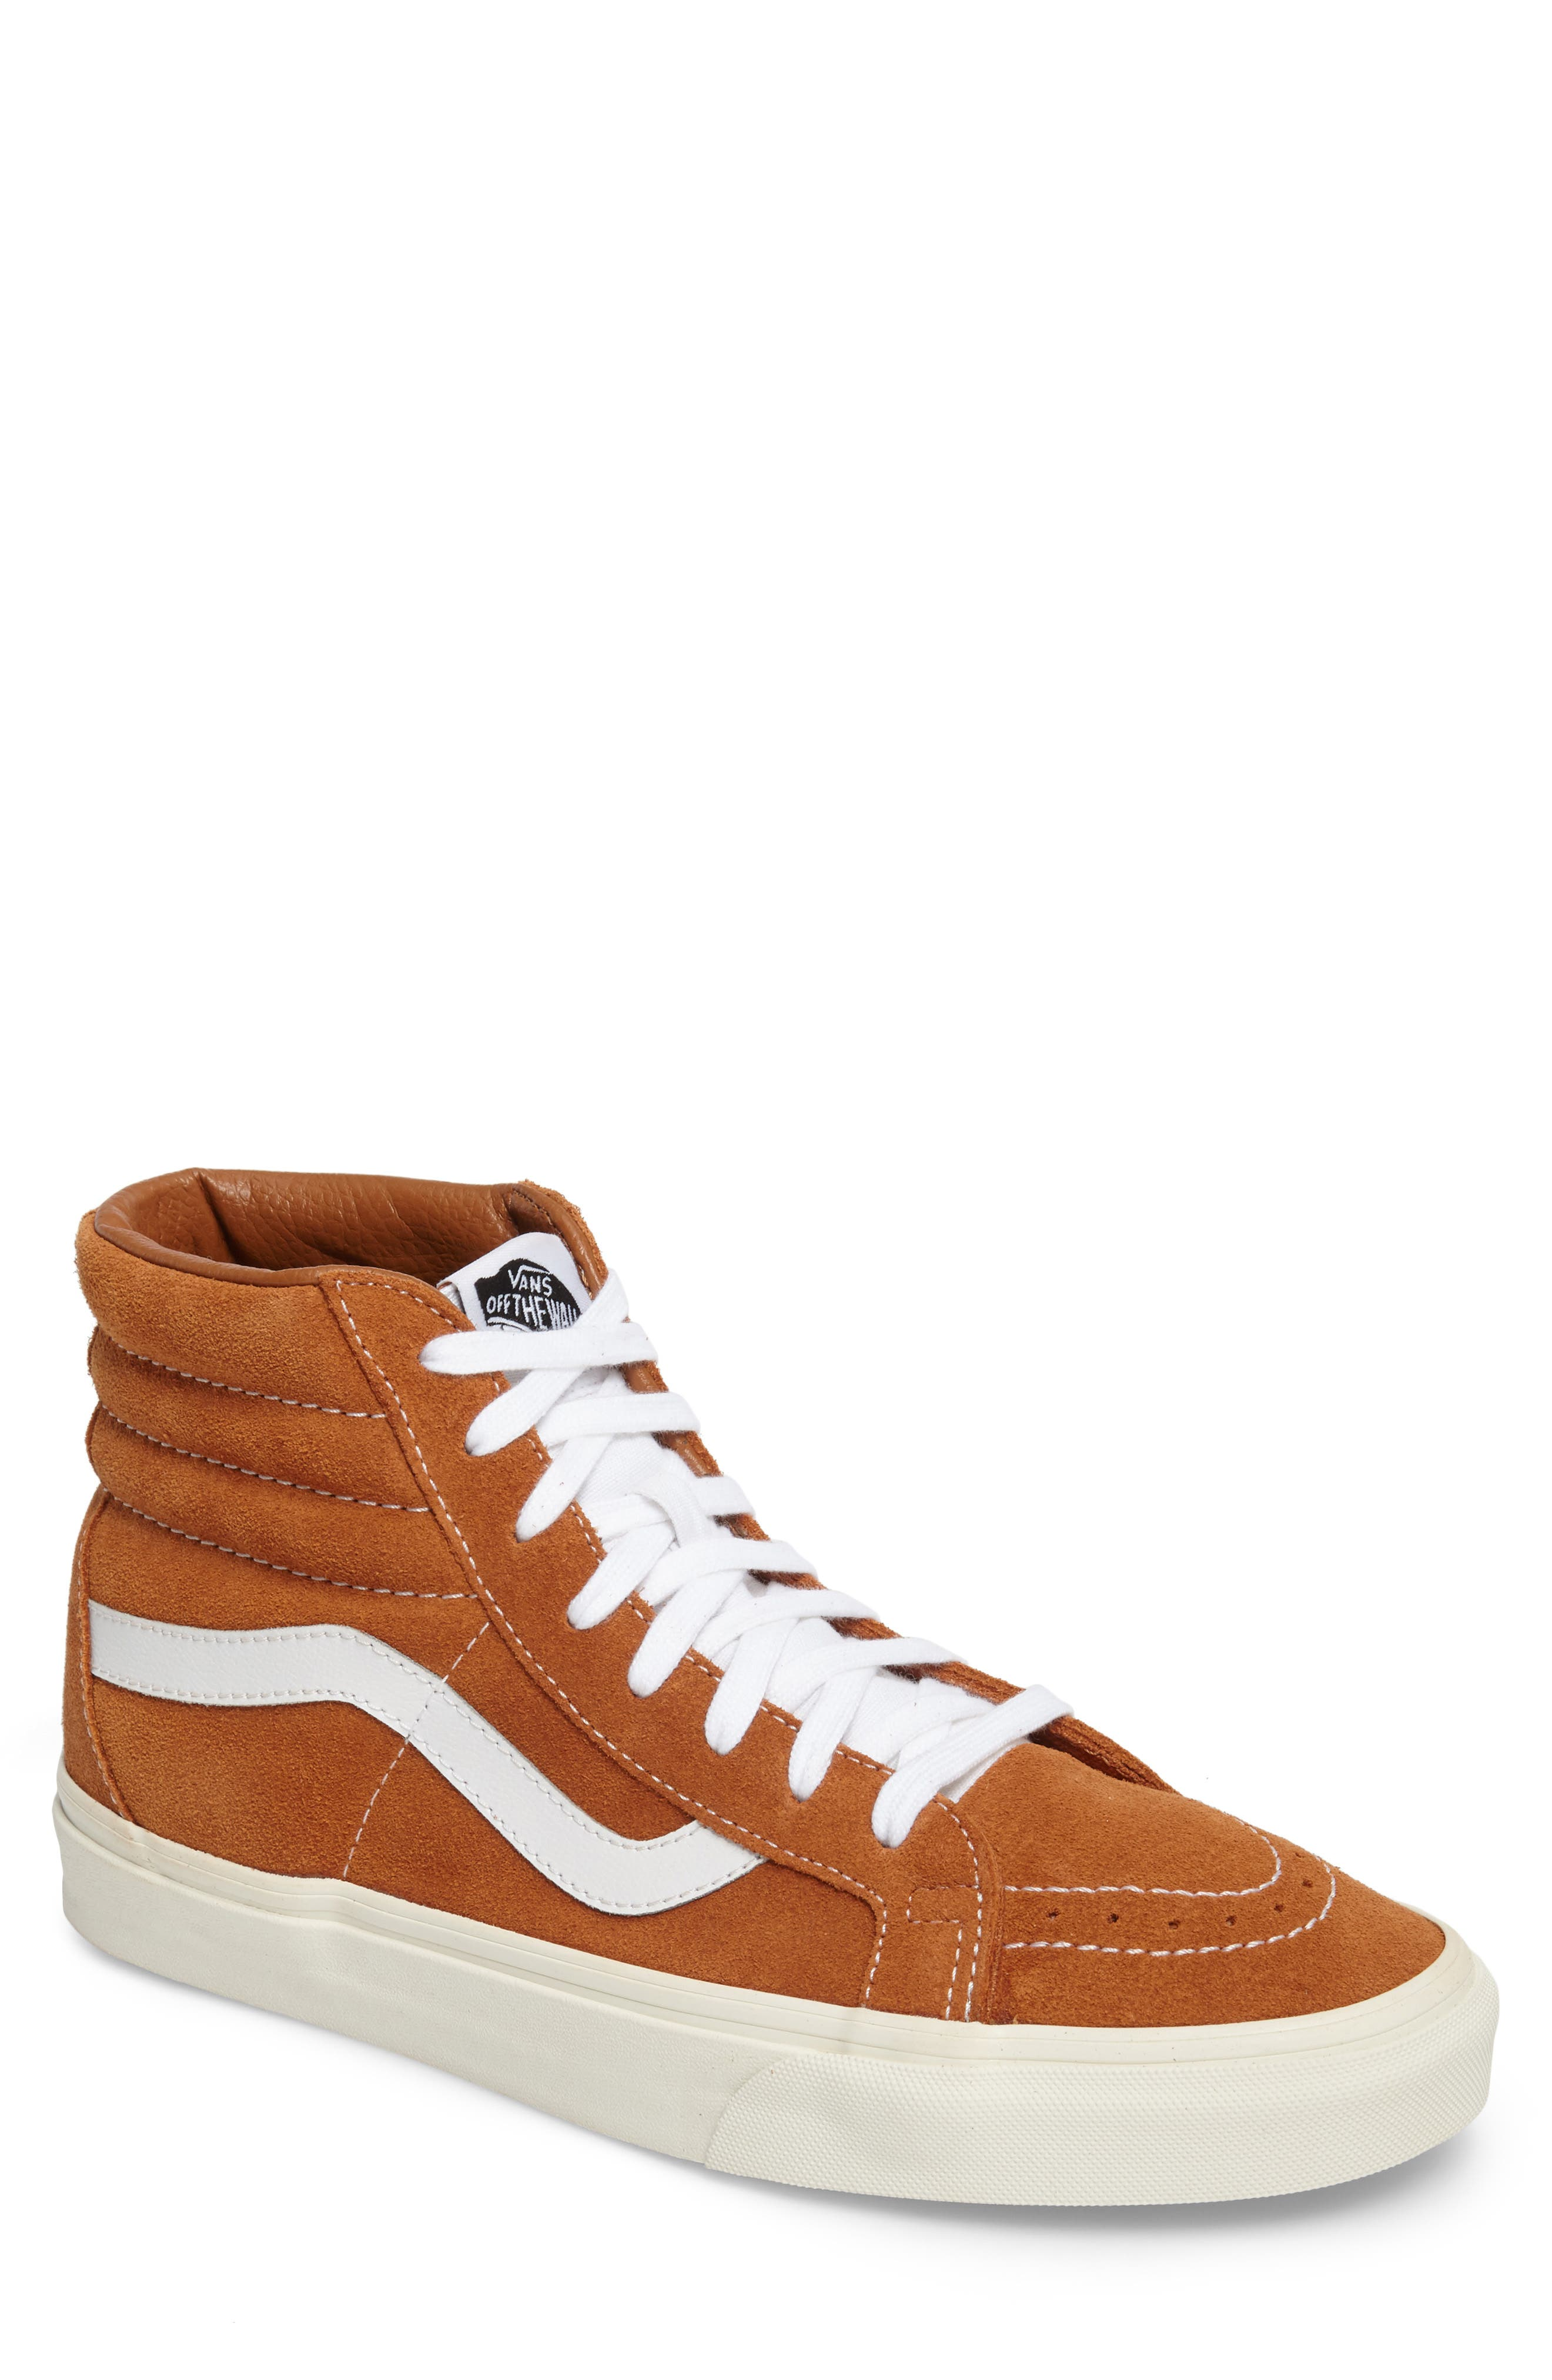 Alternate Image 1 Selected - Vans Sk8-Hi Reissue Sneaker (Men)